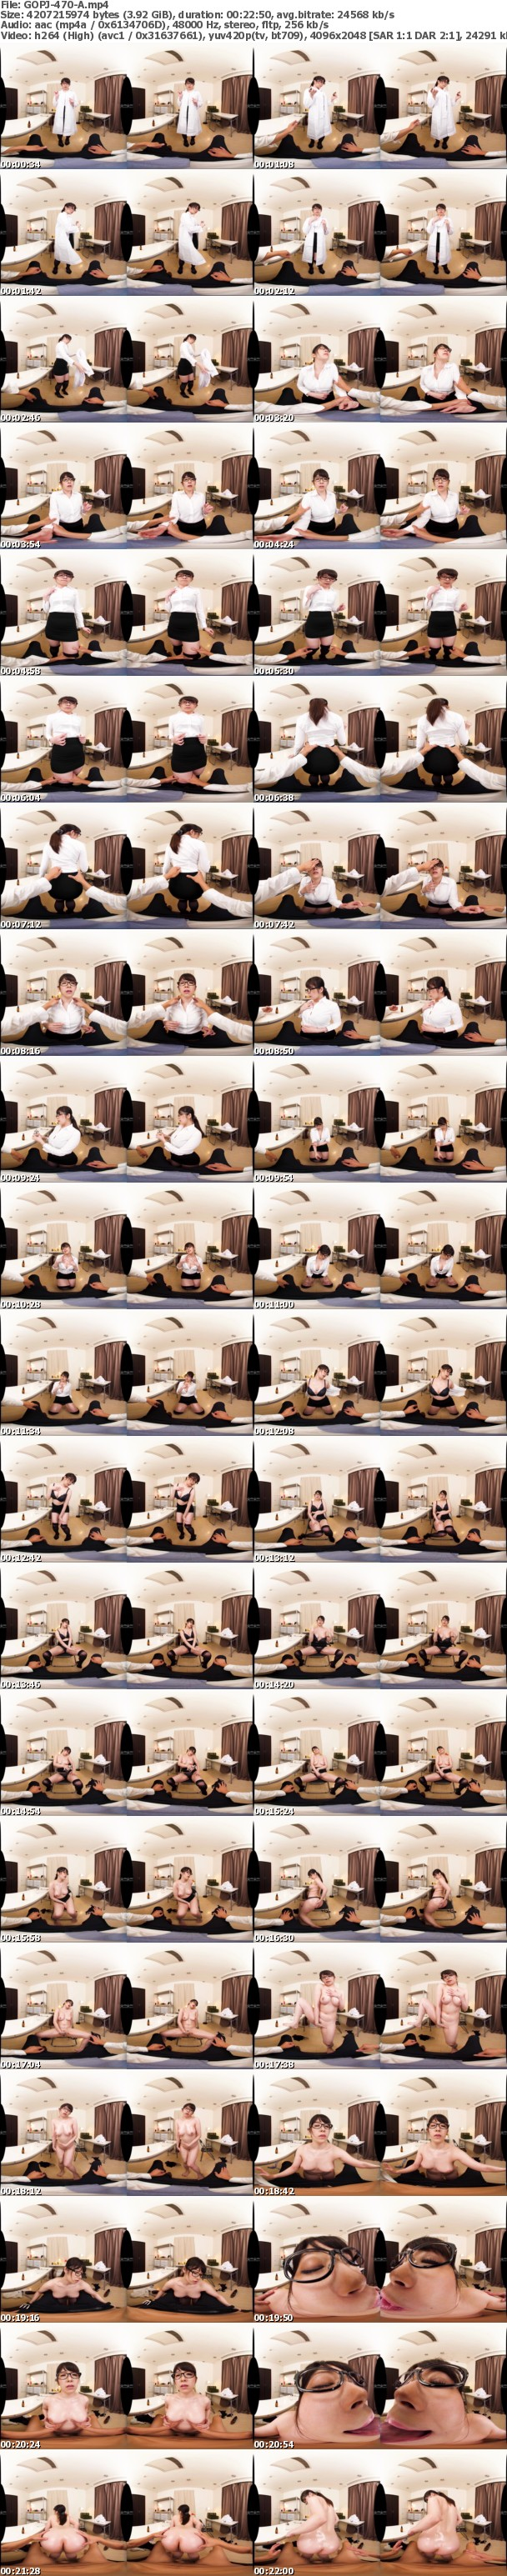 (VR) GOPJ-470 HQ 劇的超高画質 爆乳美女 媚薬で淫乱性獣化!発情し肉●を貪り 感度上昇限界突破の痙攣昇天!